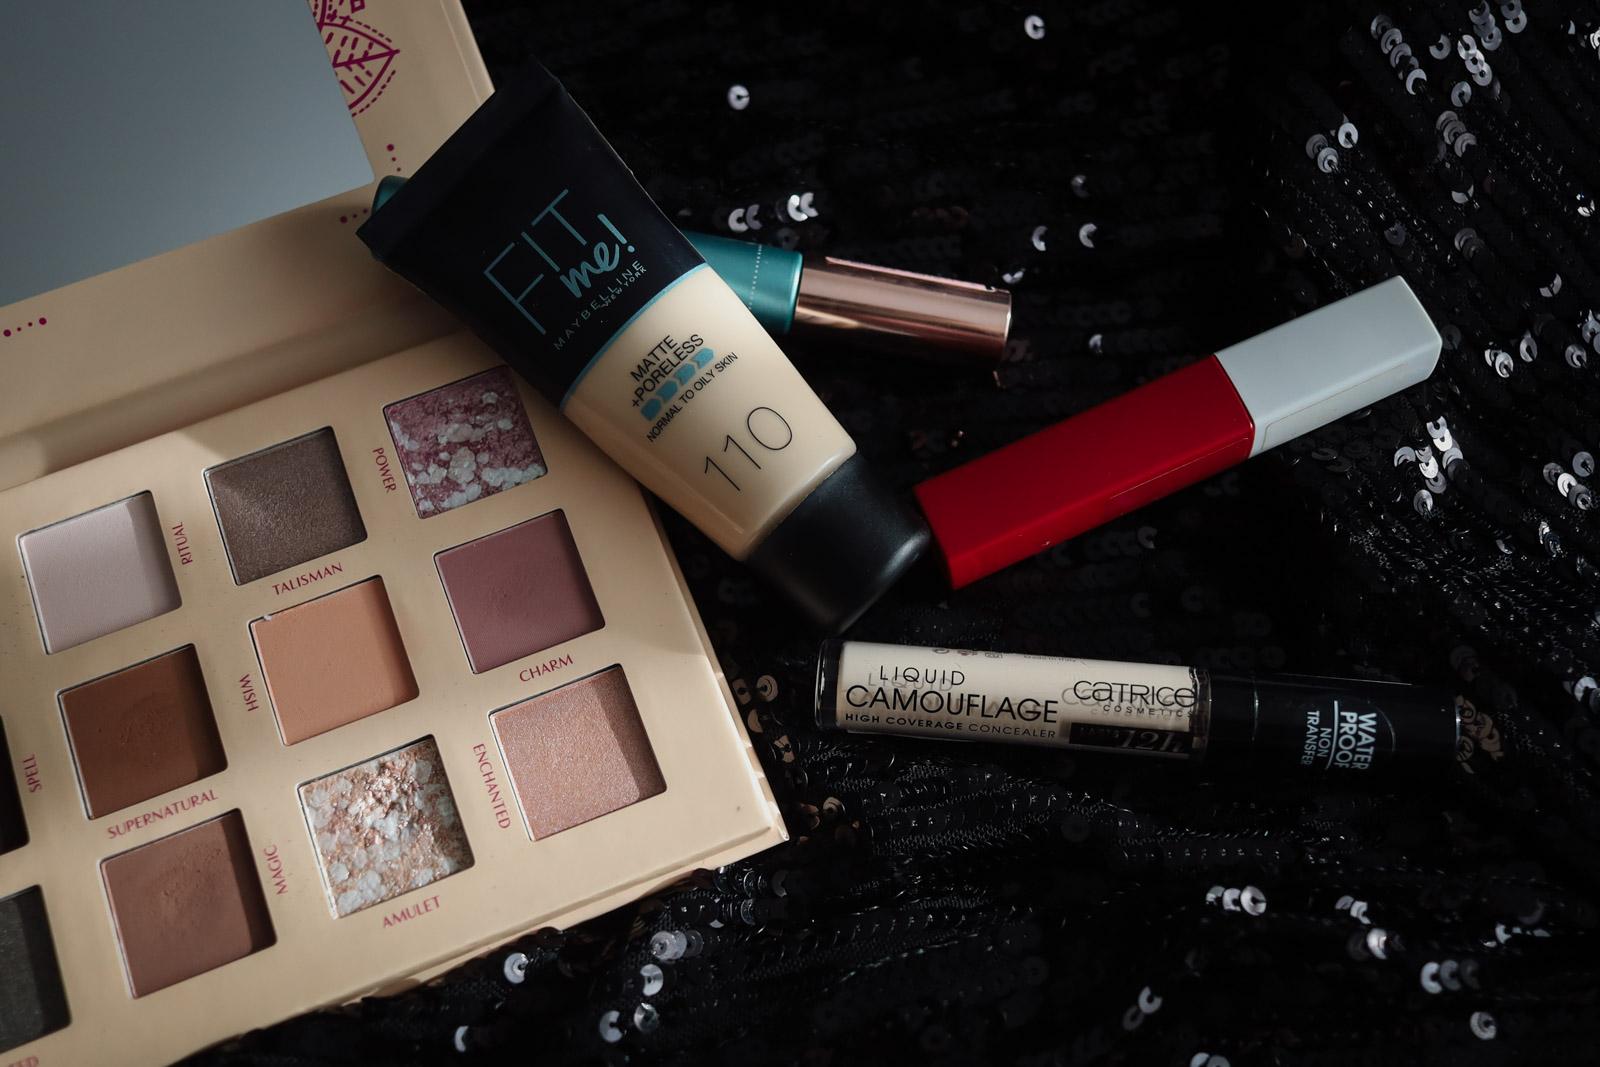 Maquilhagem essence, Catrice, L'Óreal Paris & Maybelline